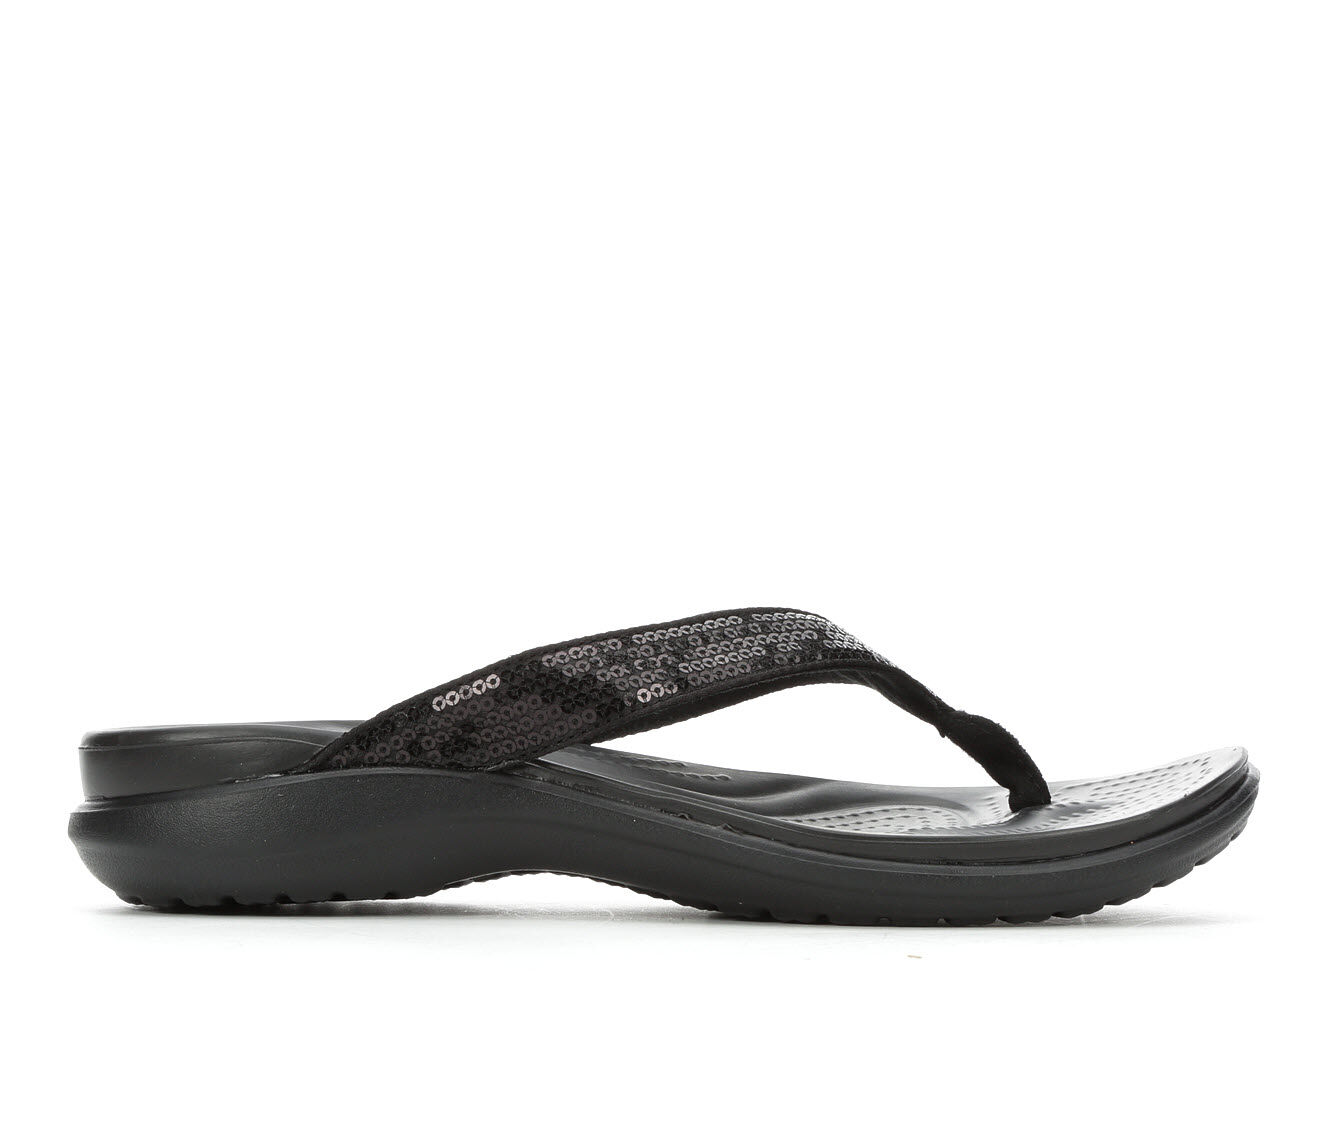 Women's Crocs Capri V Sequin Flip-Flops Black